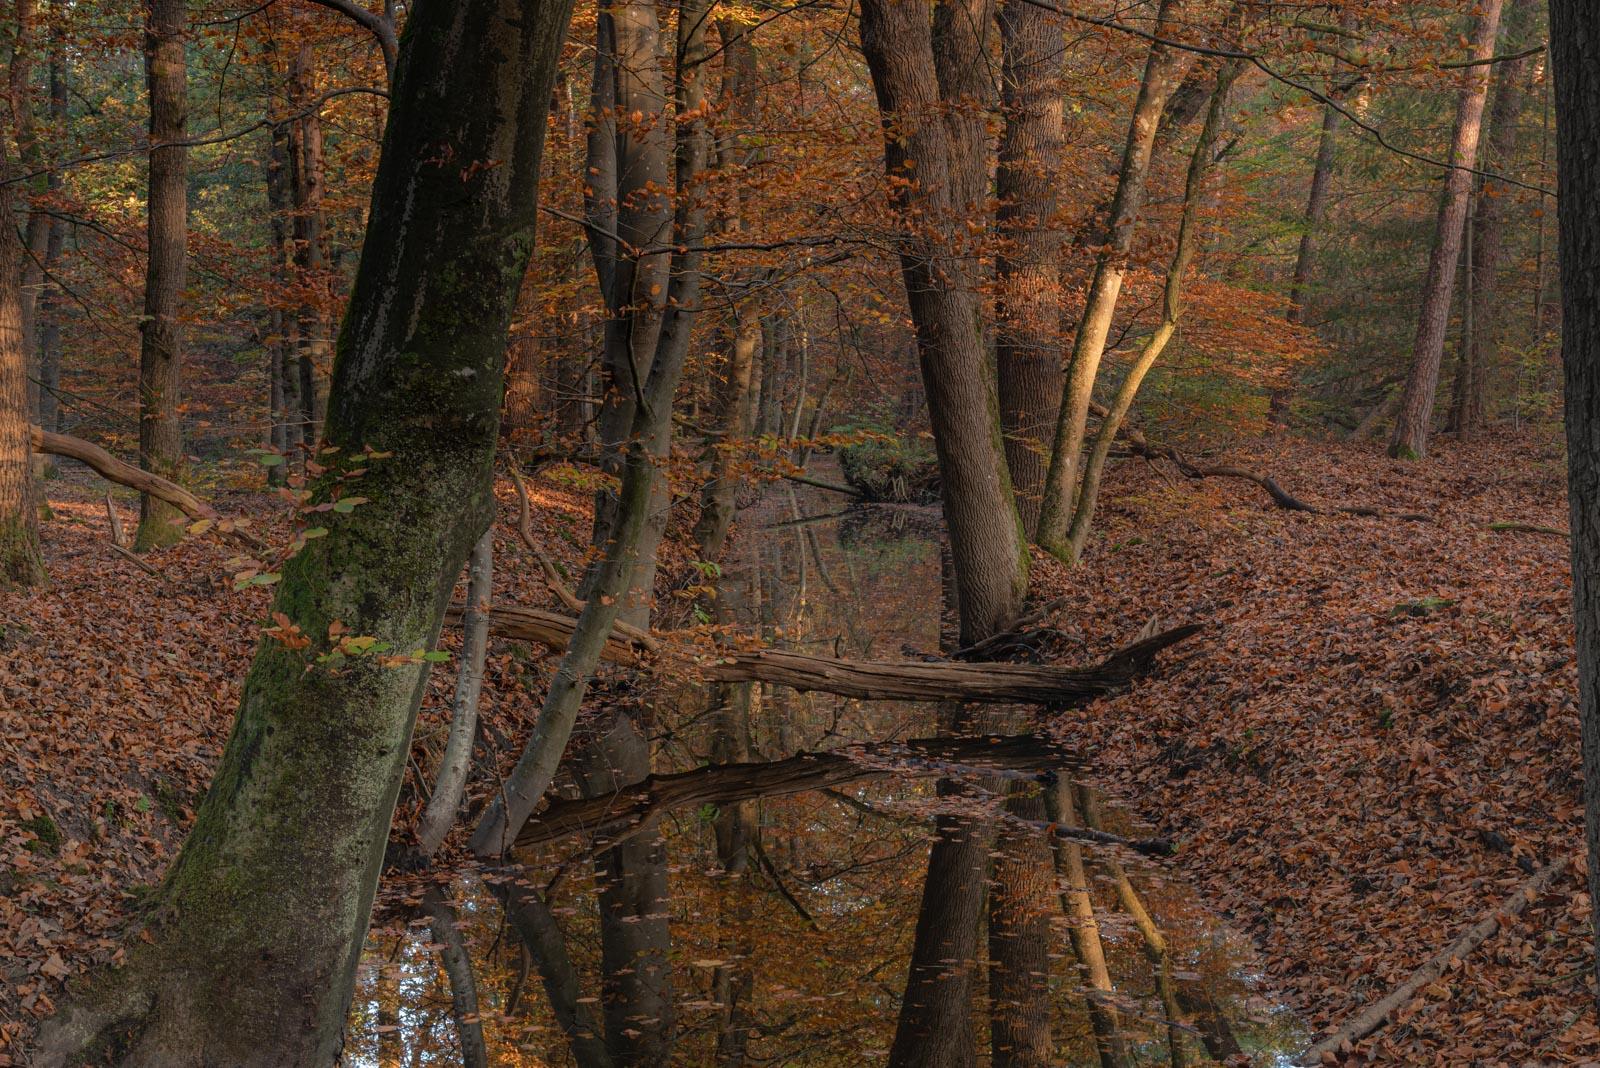 Gallery-Natuur Leuvenumse Bos in de vroege ochtend zon 4911